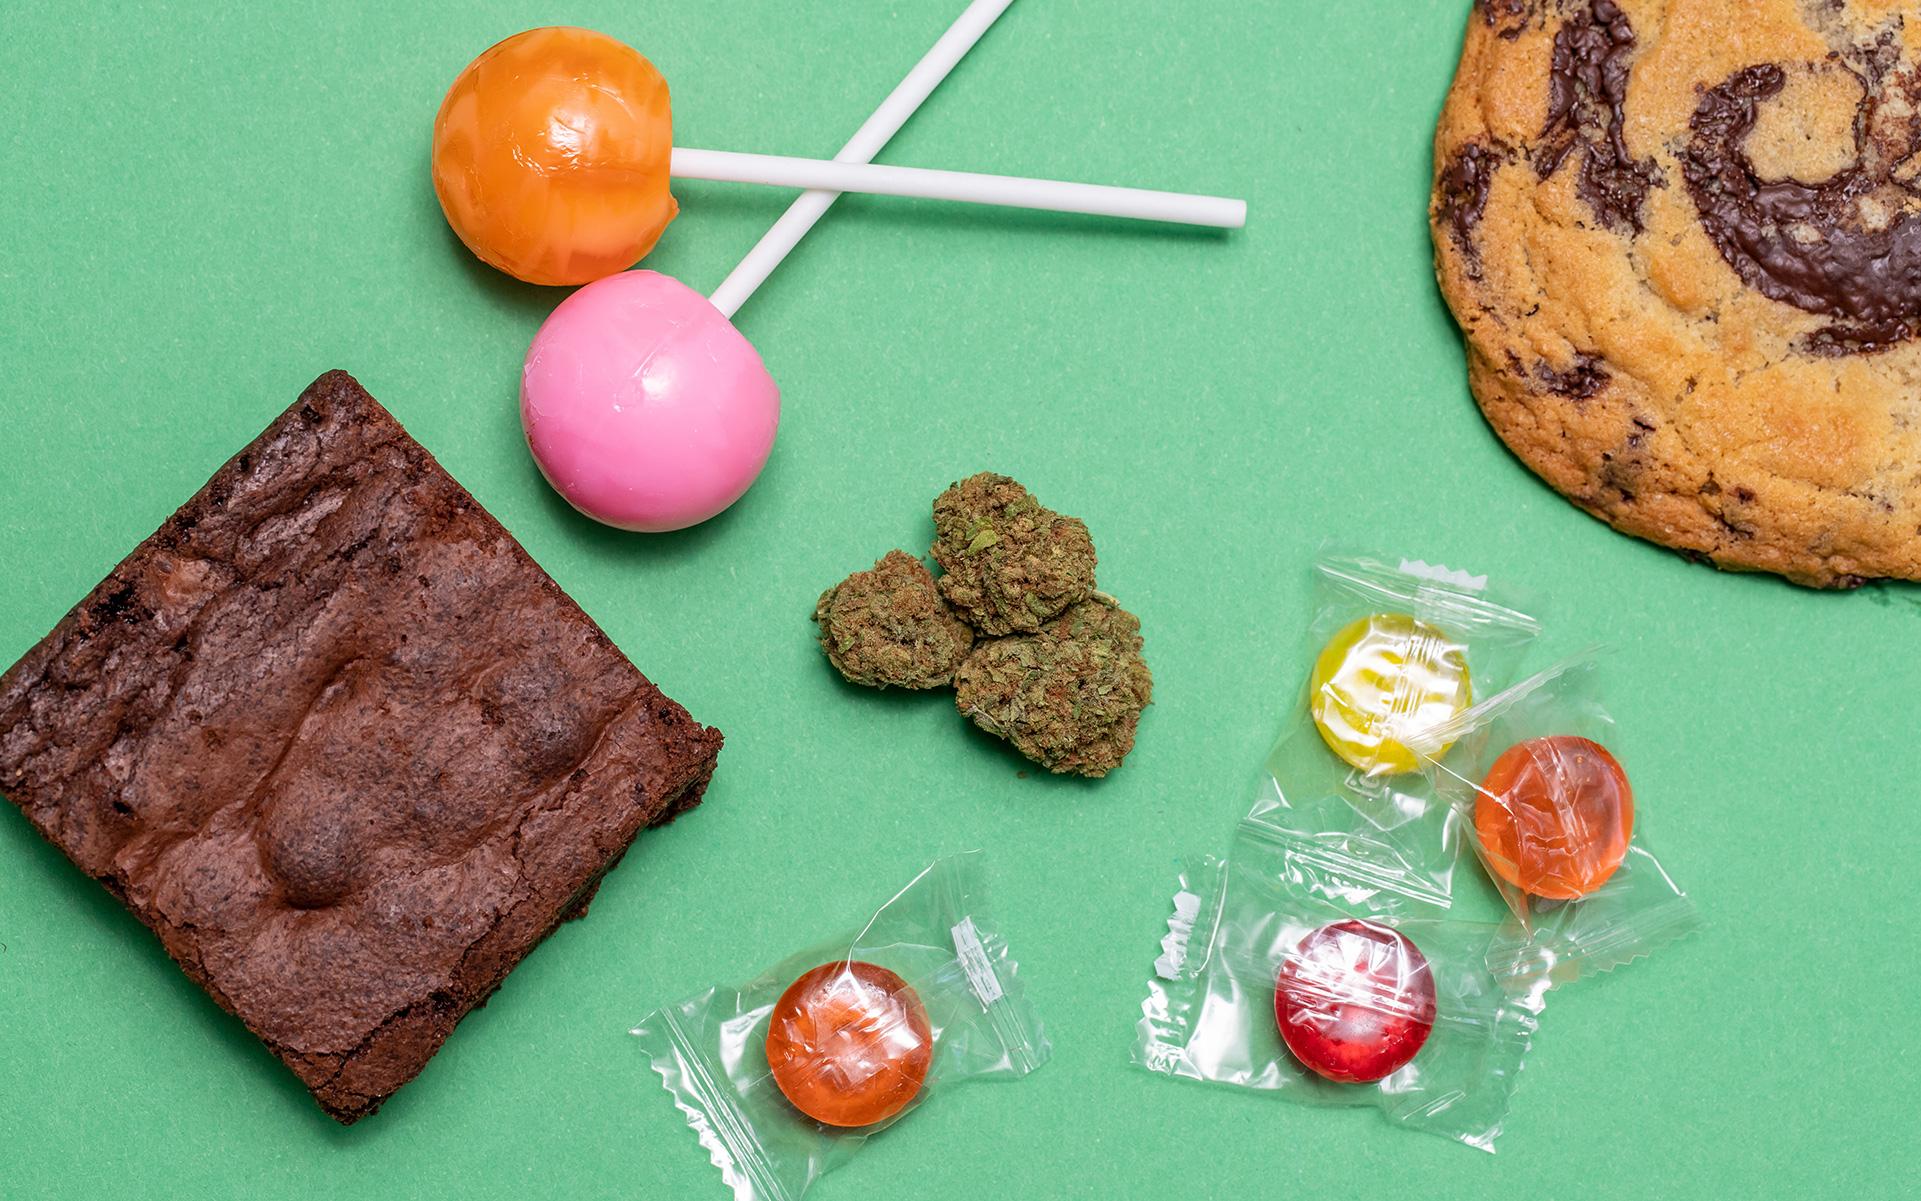 cannabis edibles legal in canada, marijuana edibles, canada legislature for cannabis edibles